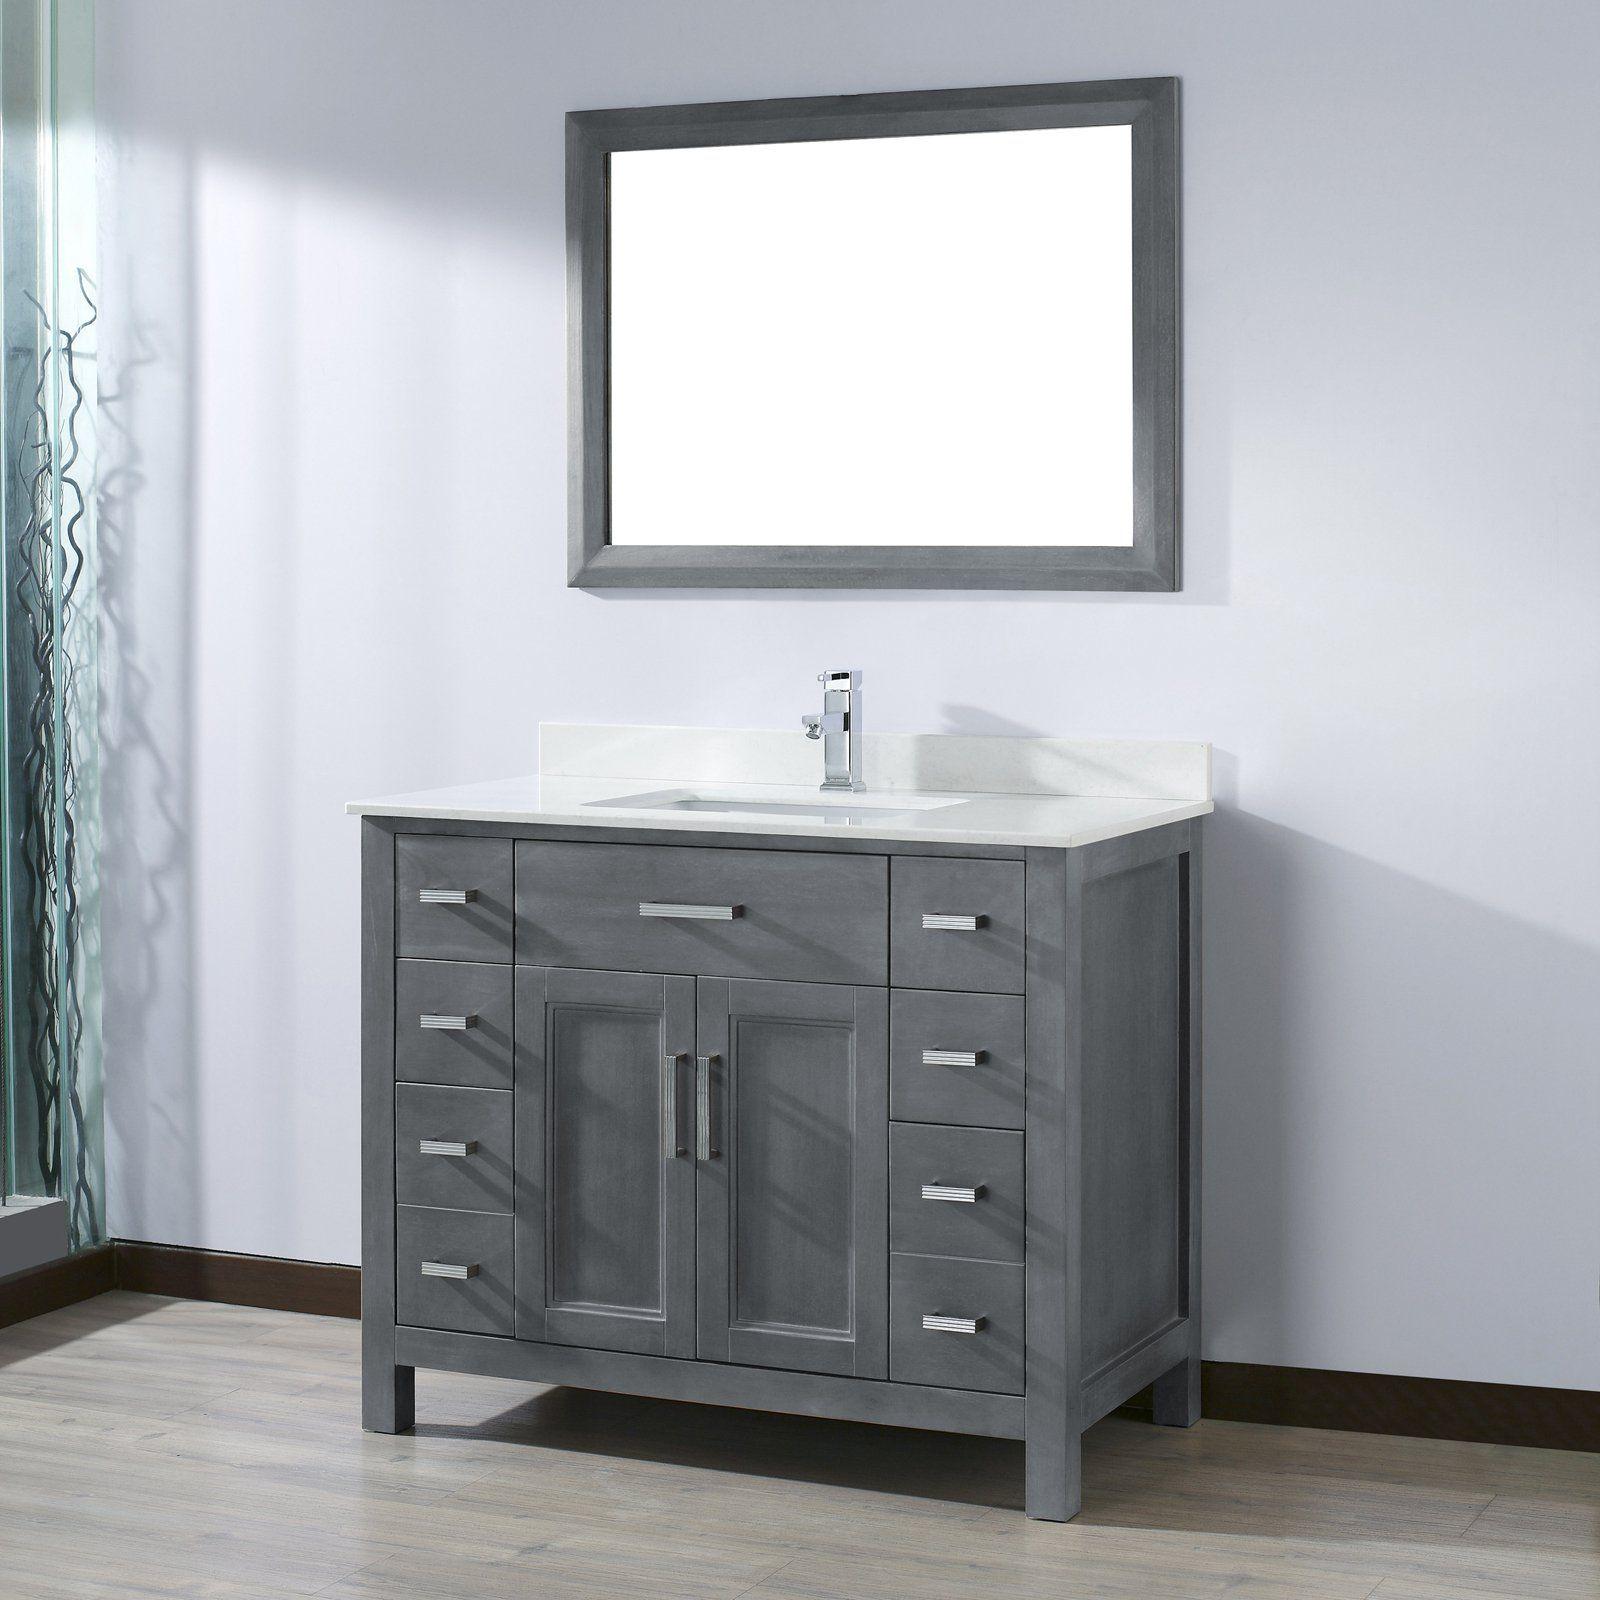 Bauhaus Bath Celize 42 In Single Bathroom Vanity Set With Mirror